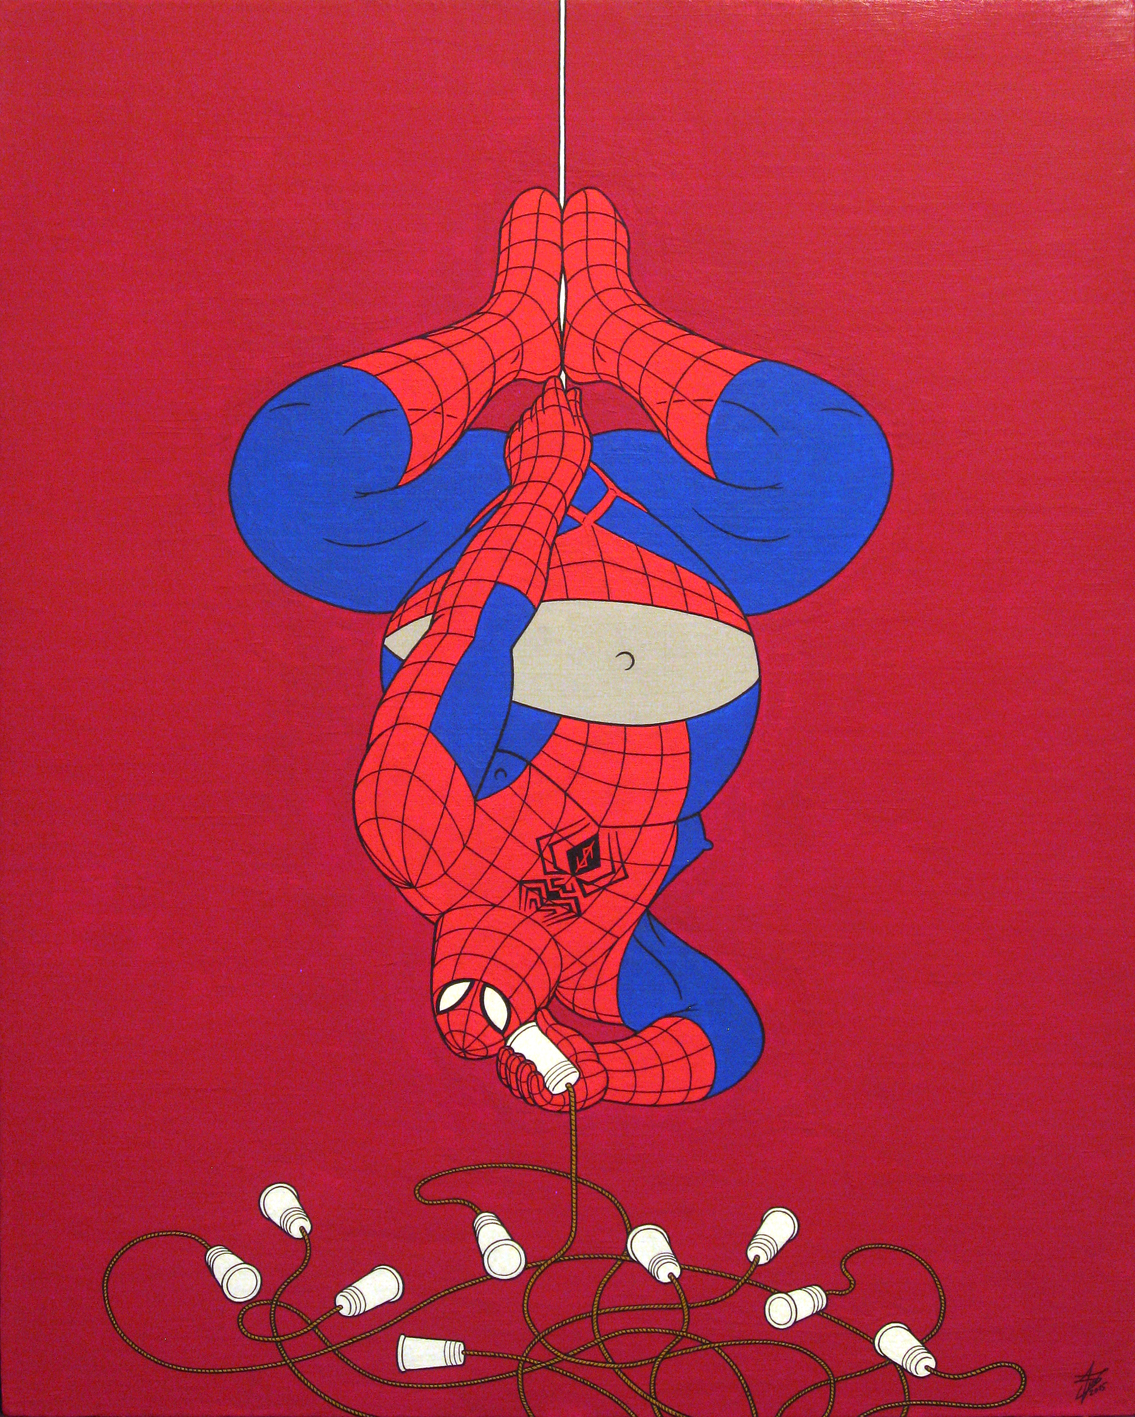 Wwweb-man, acrylic on panel canvas, 50x40cm, 2015 by alexander982